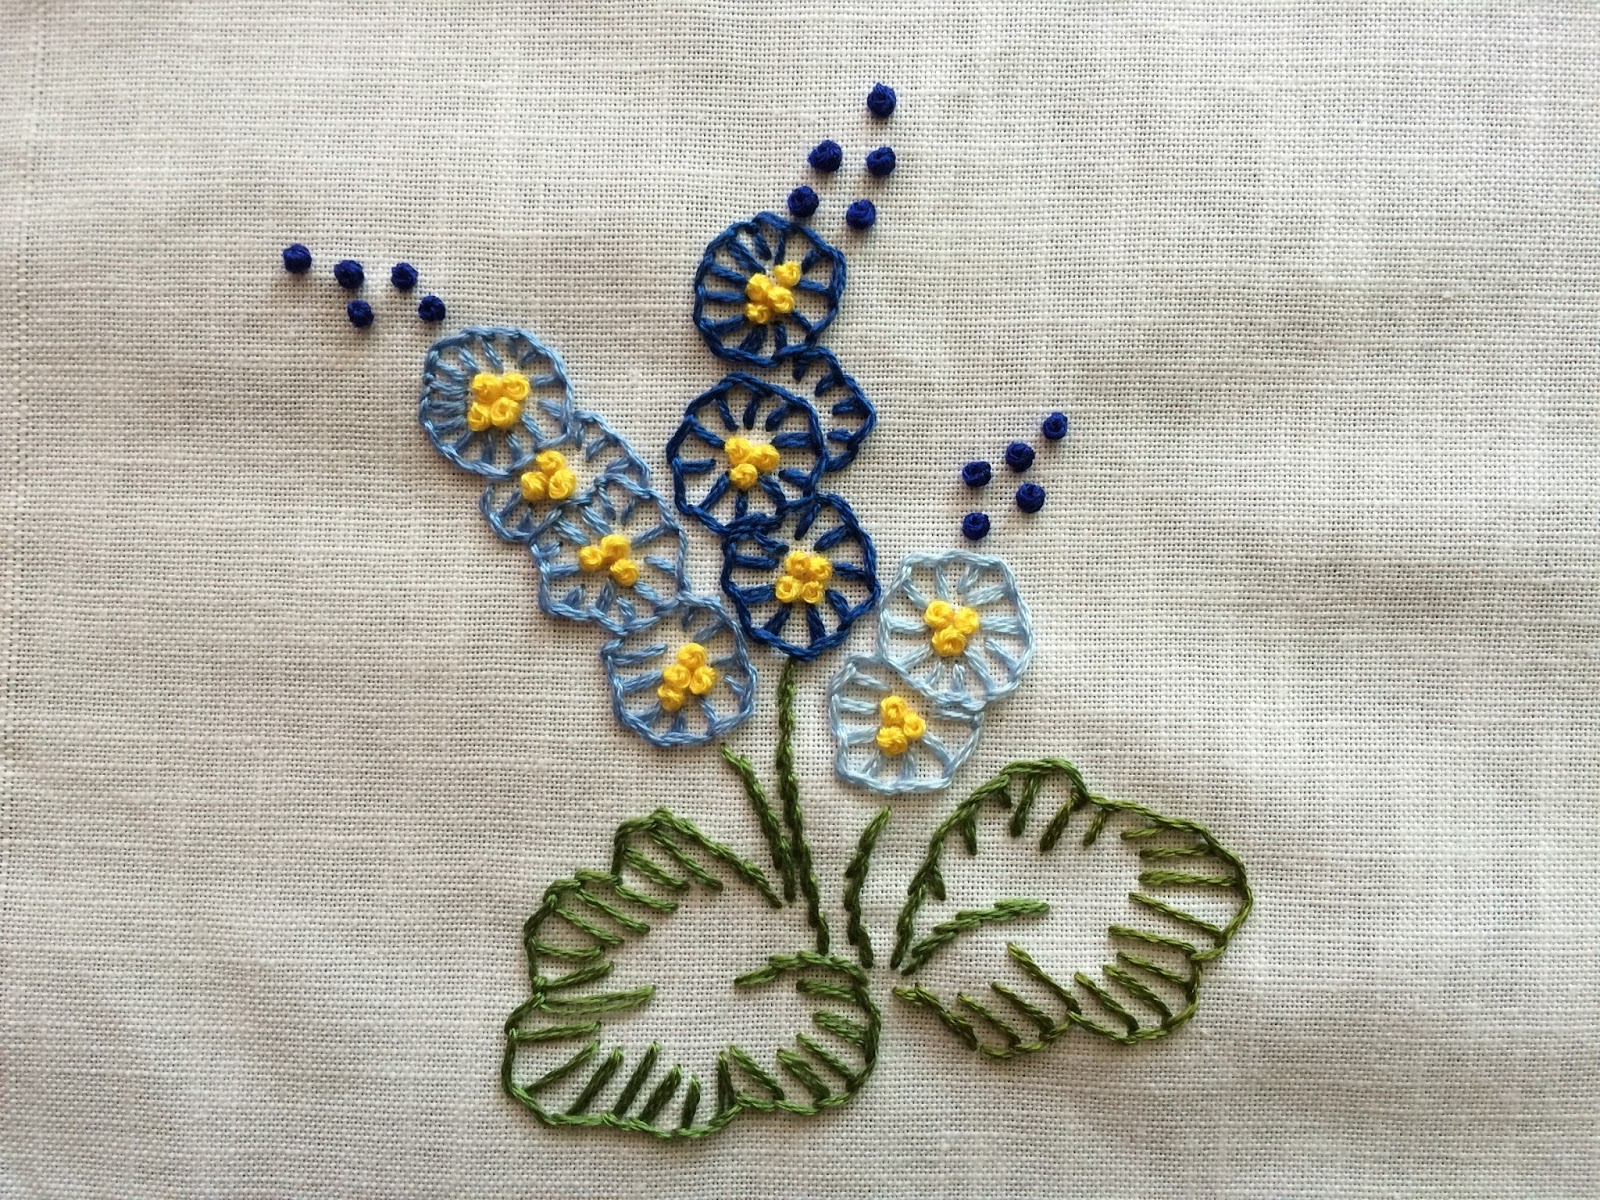 Mooshiestitch blanket buttonhole stitch flowers